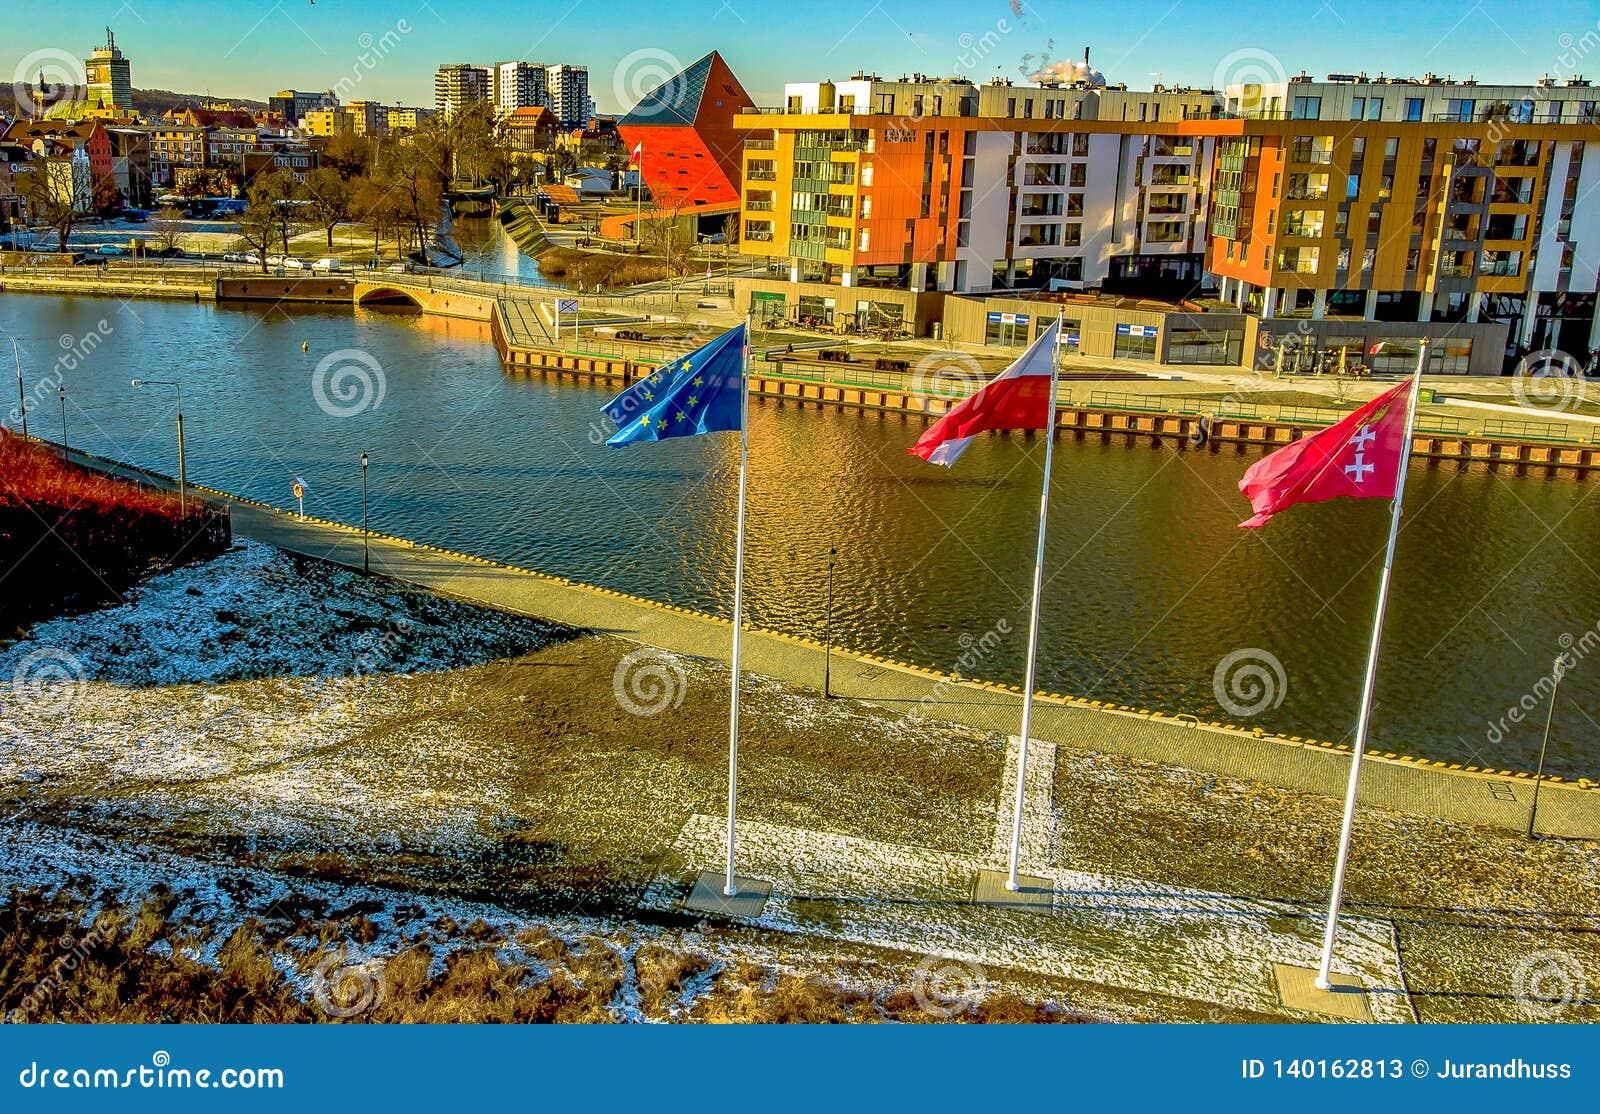 De Moderne Stad van Gdansk